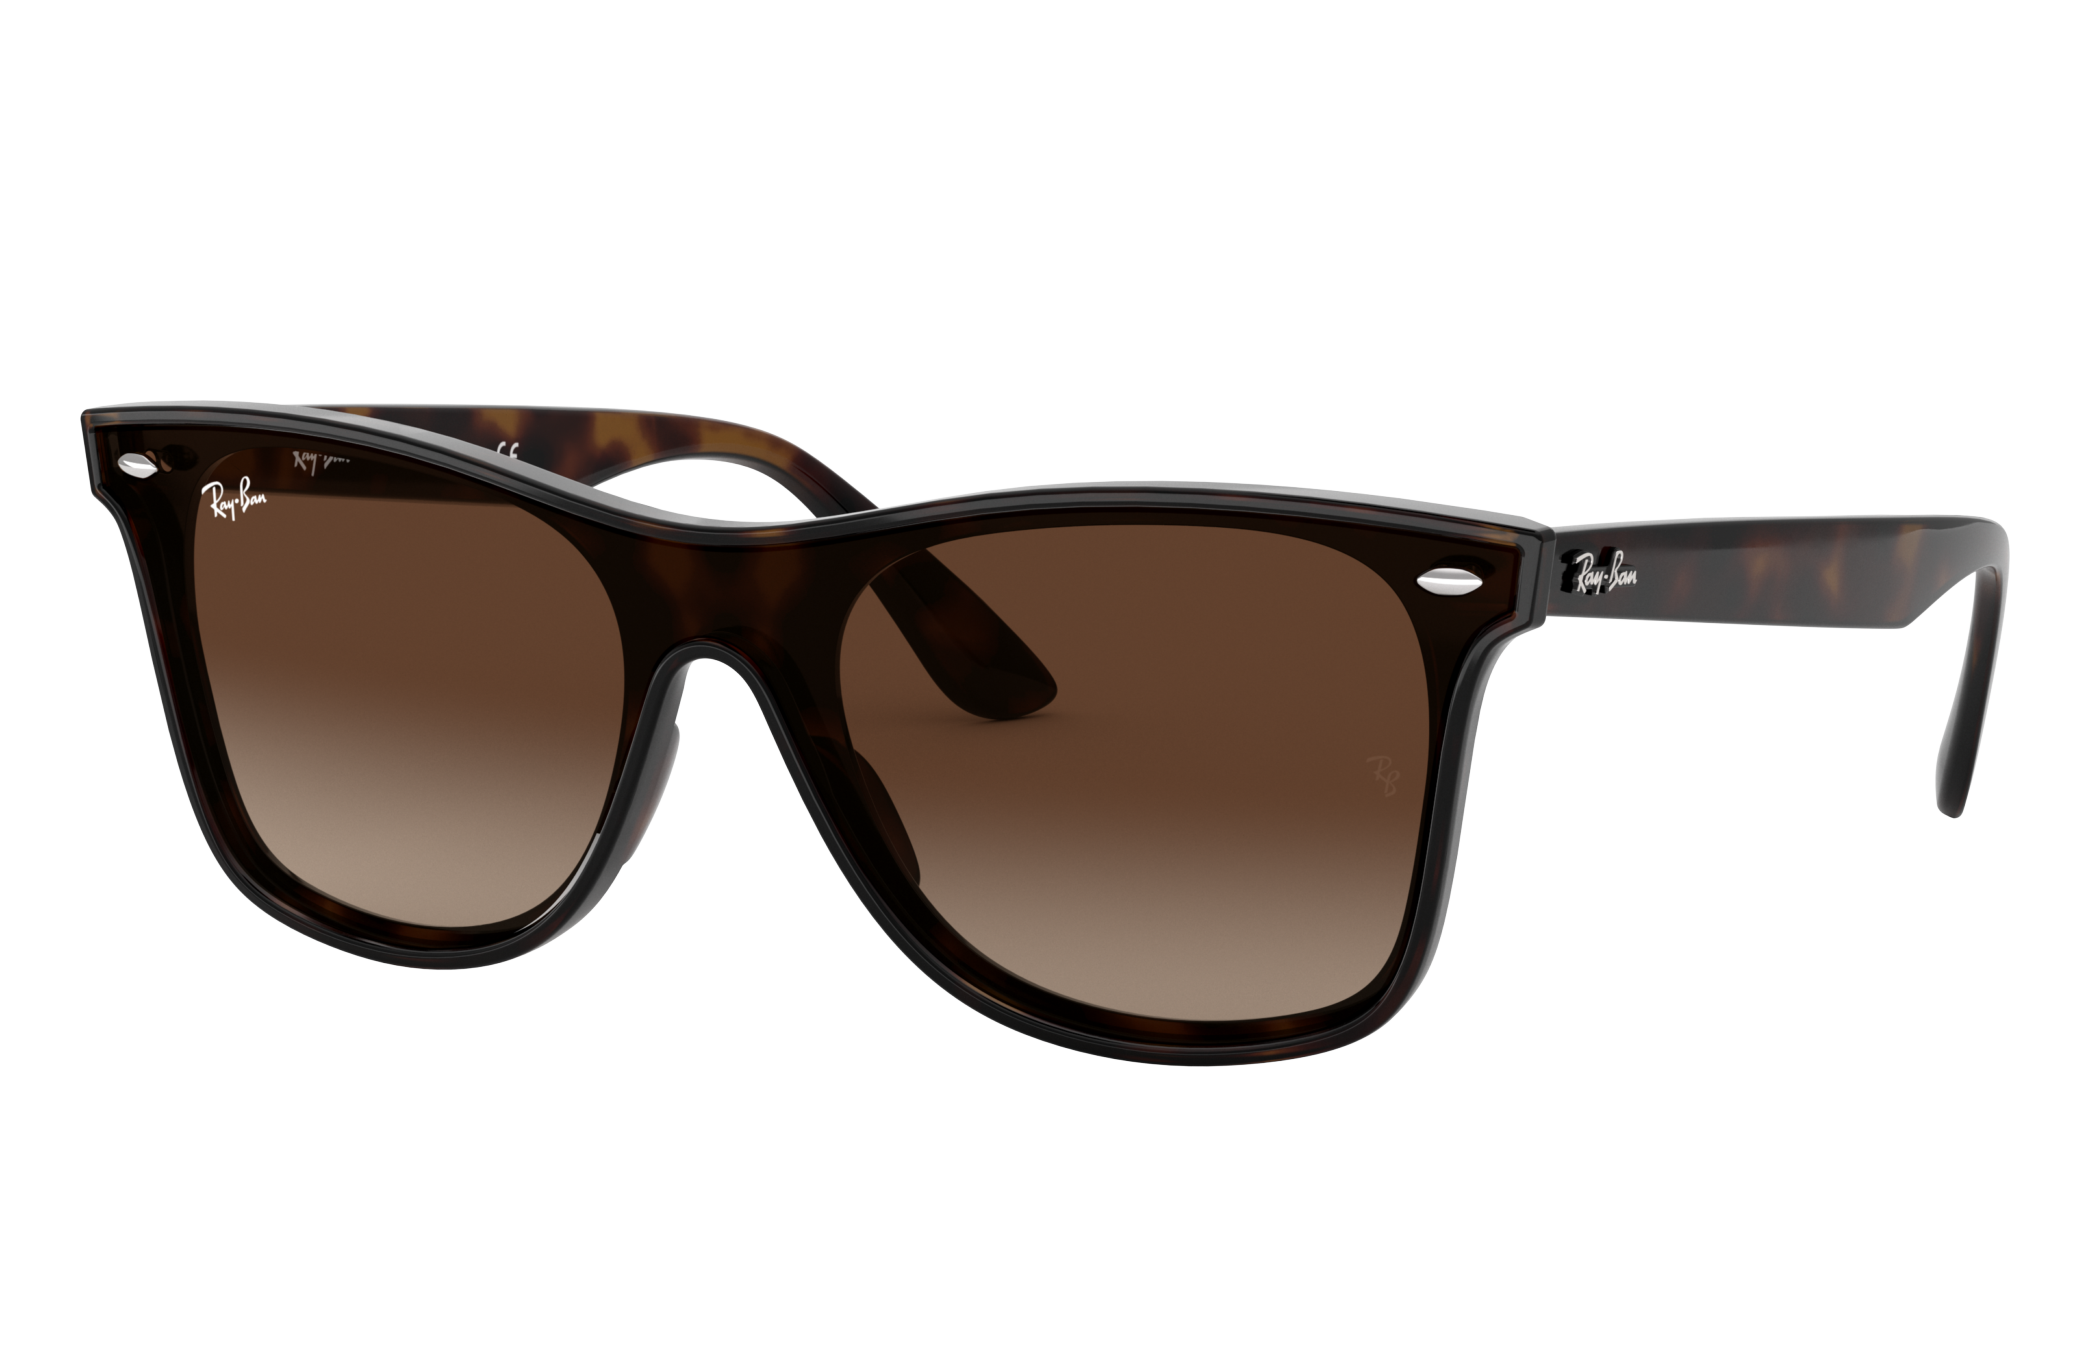 Ray-Ban Blaze Wayfarer Tortoise, Brown Lenses - RB4440N